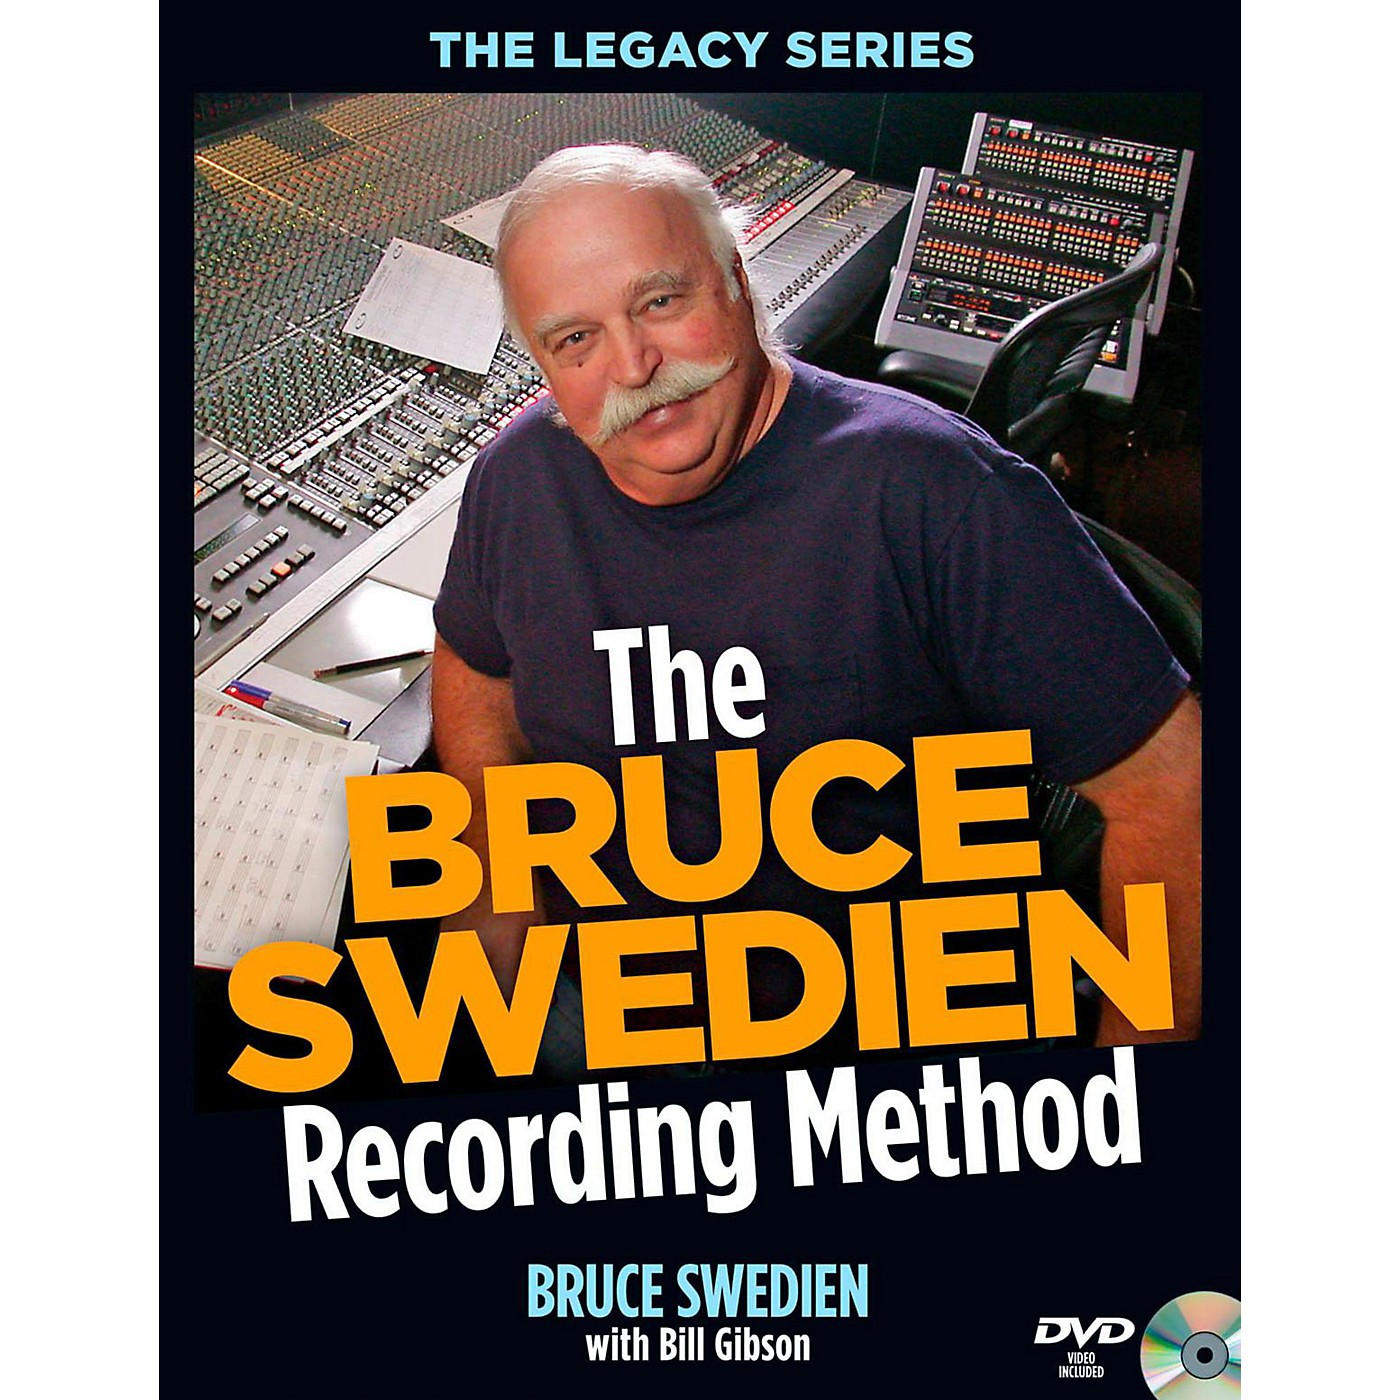 Hal Leonard The Bruce Swedien Recording Method Book/DVD-ROM thumbnail